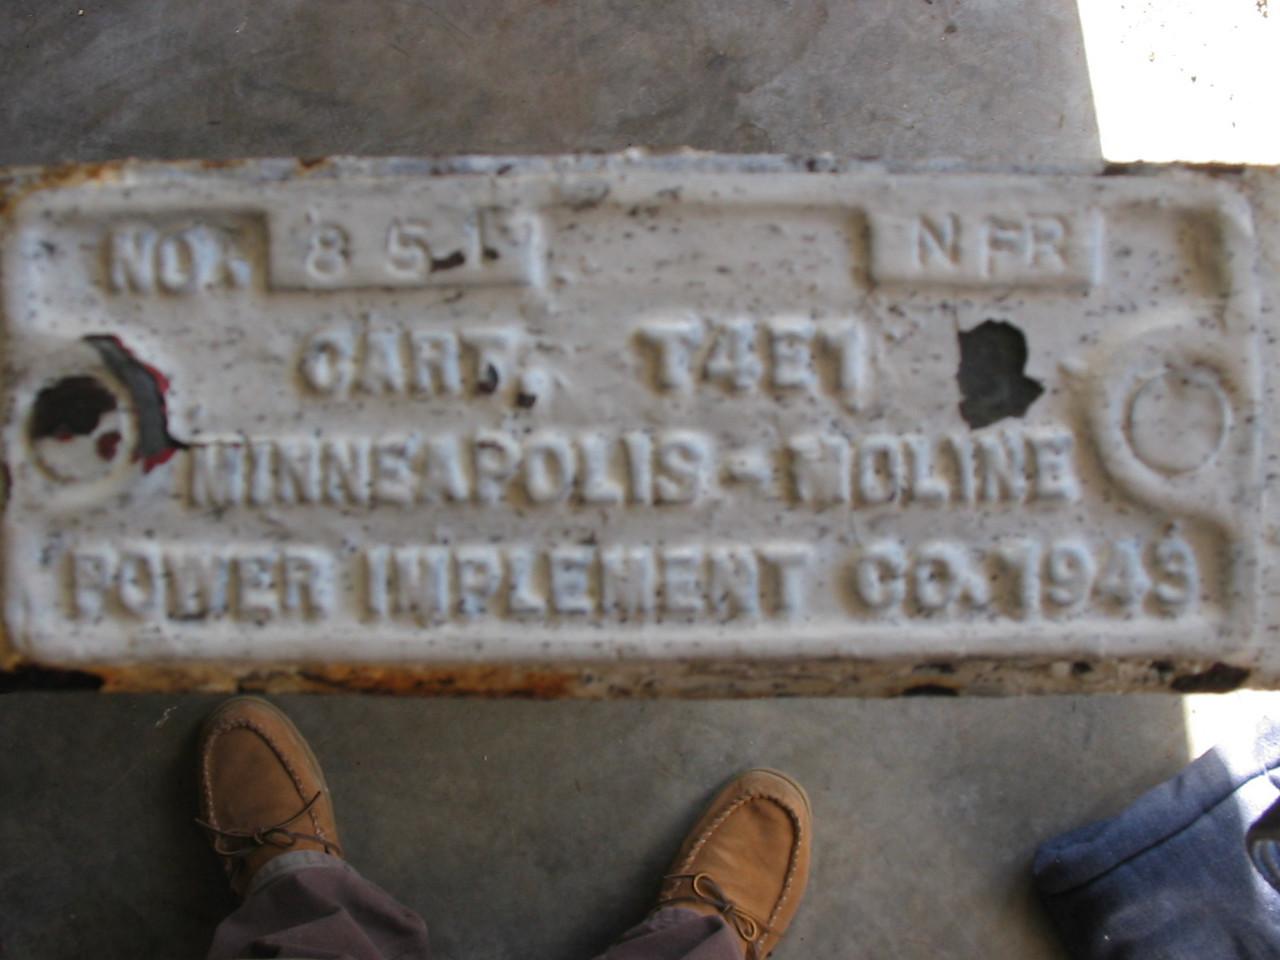 1943 <br /> <br /> T4E1 MINNEAPOLIS-MOLINE CART<br /> <br /> SERIAL # 851<br /> <br /> (Craig Johnson Collection)